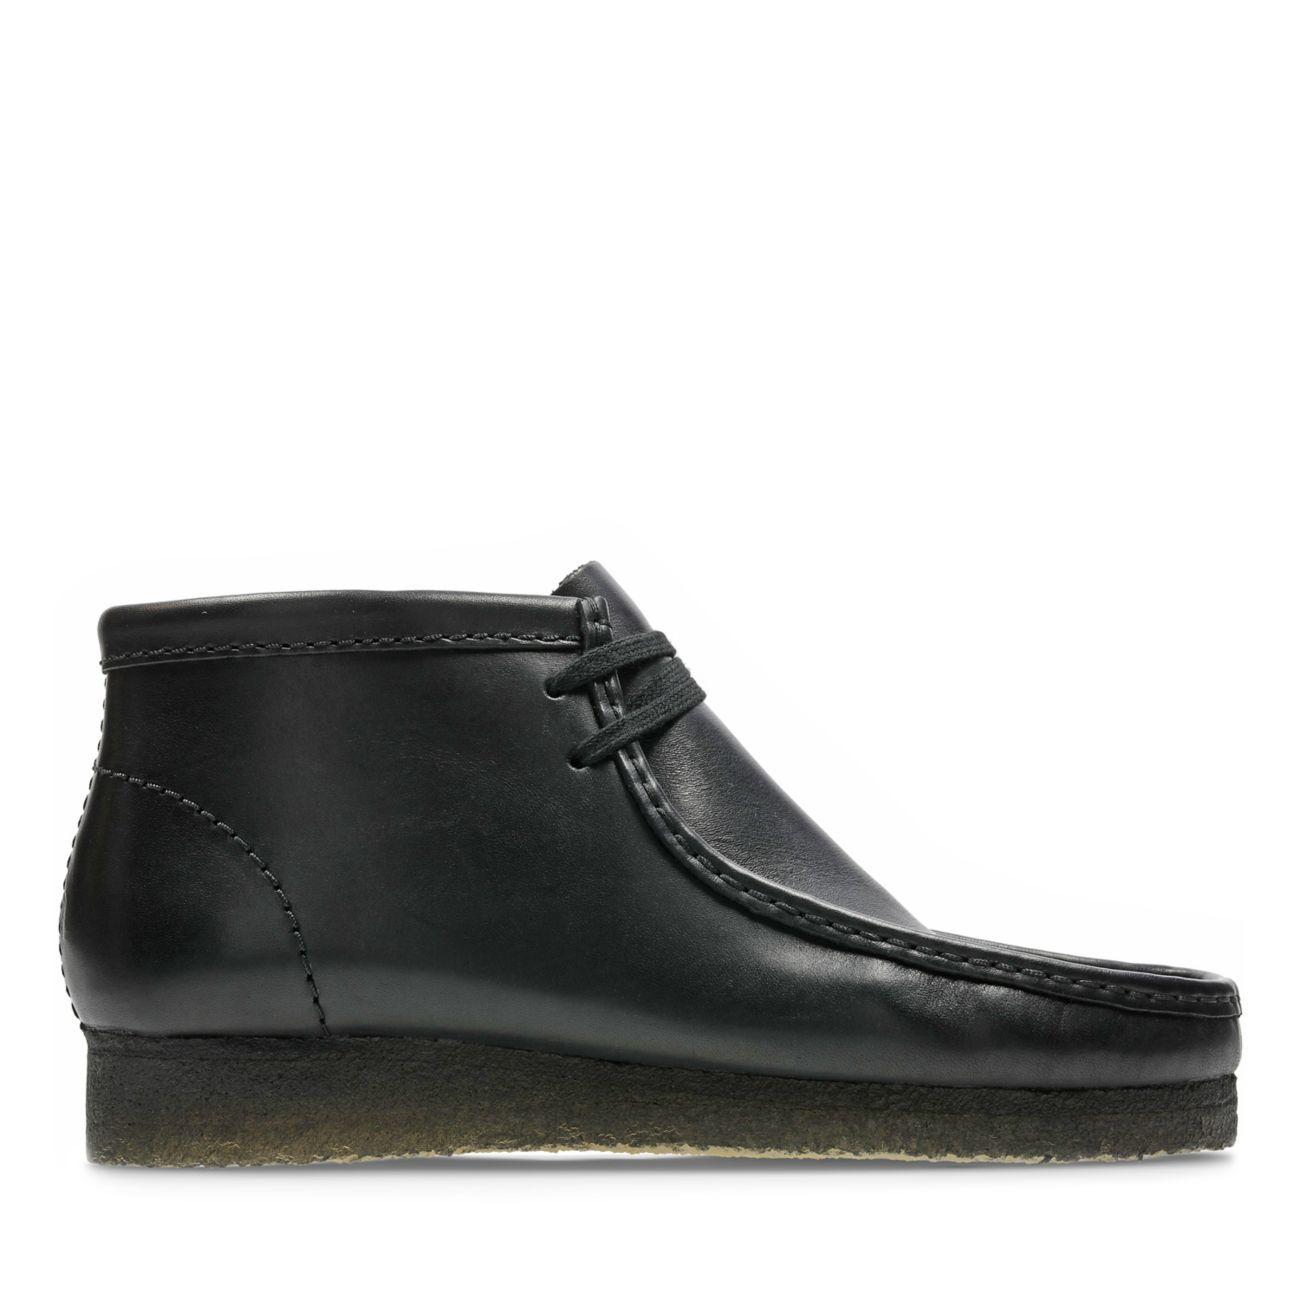 790ae898fa0 Wallabee Boot